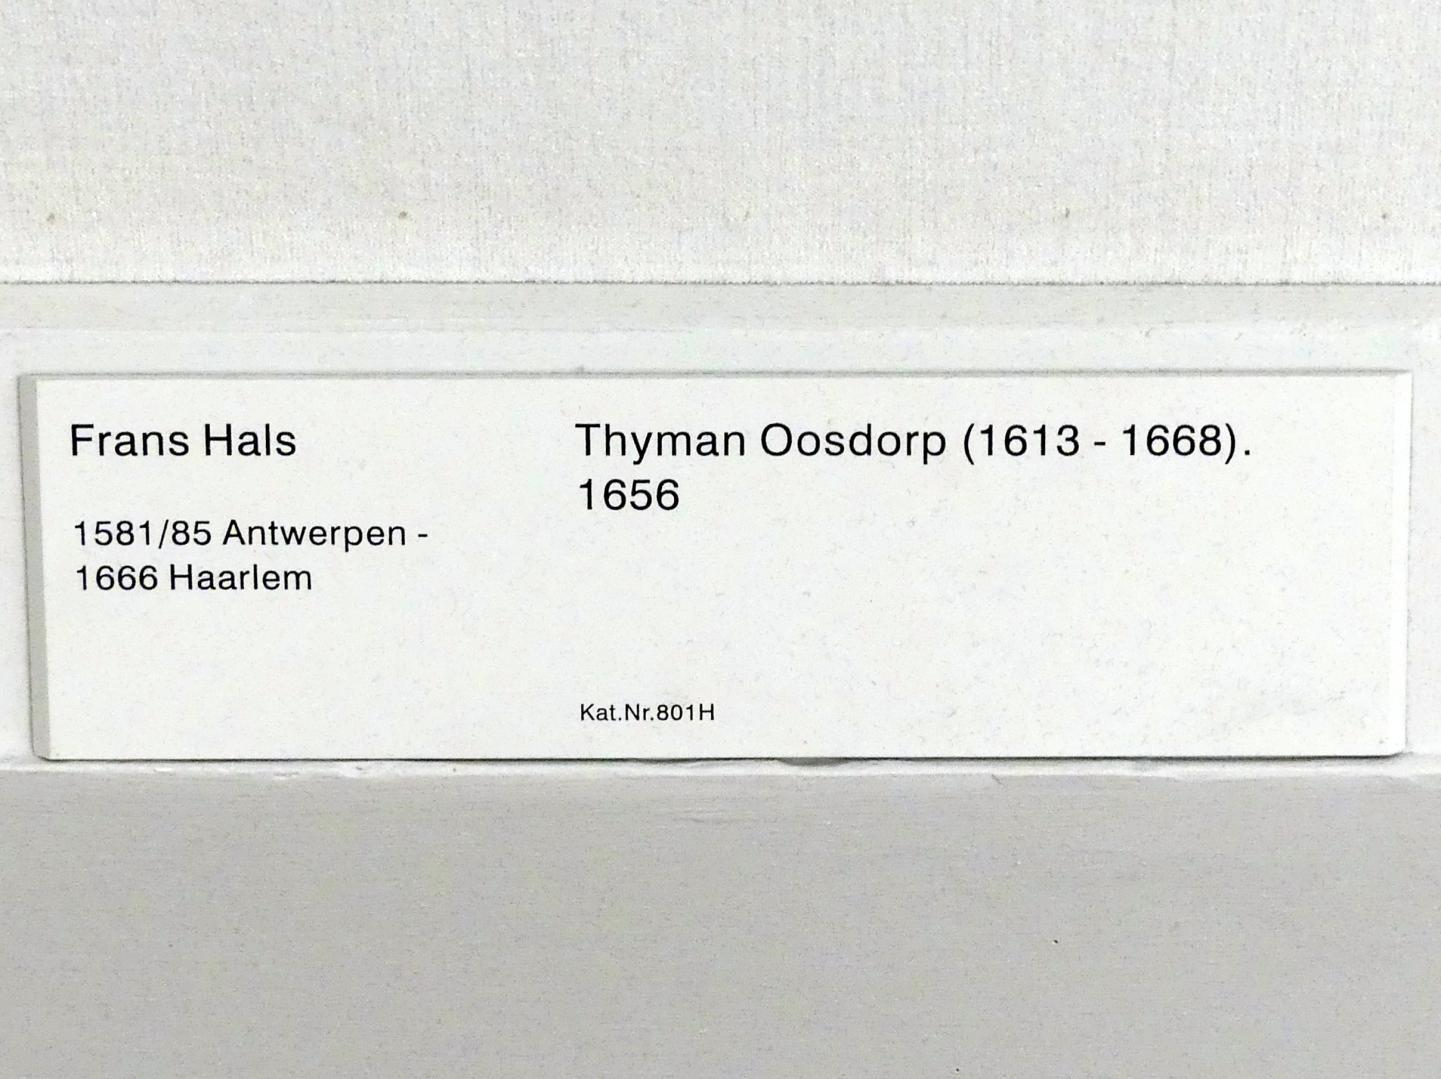 Frans Hals: Thyman Oosdorp (1613-1668), 1656, Bild 2/2